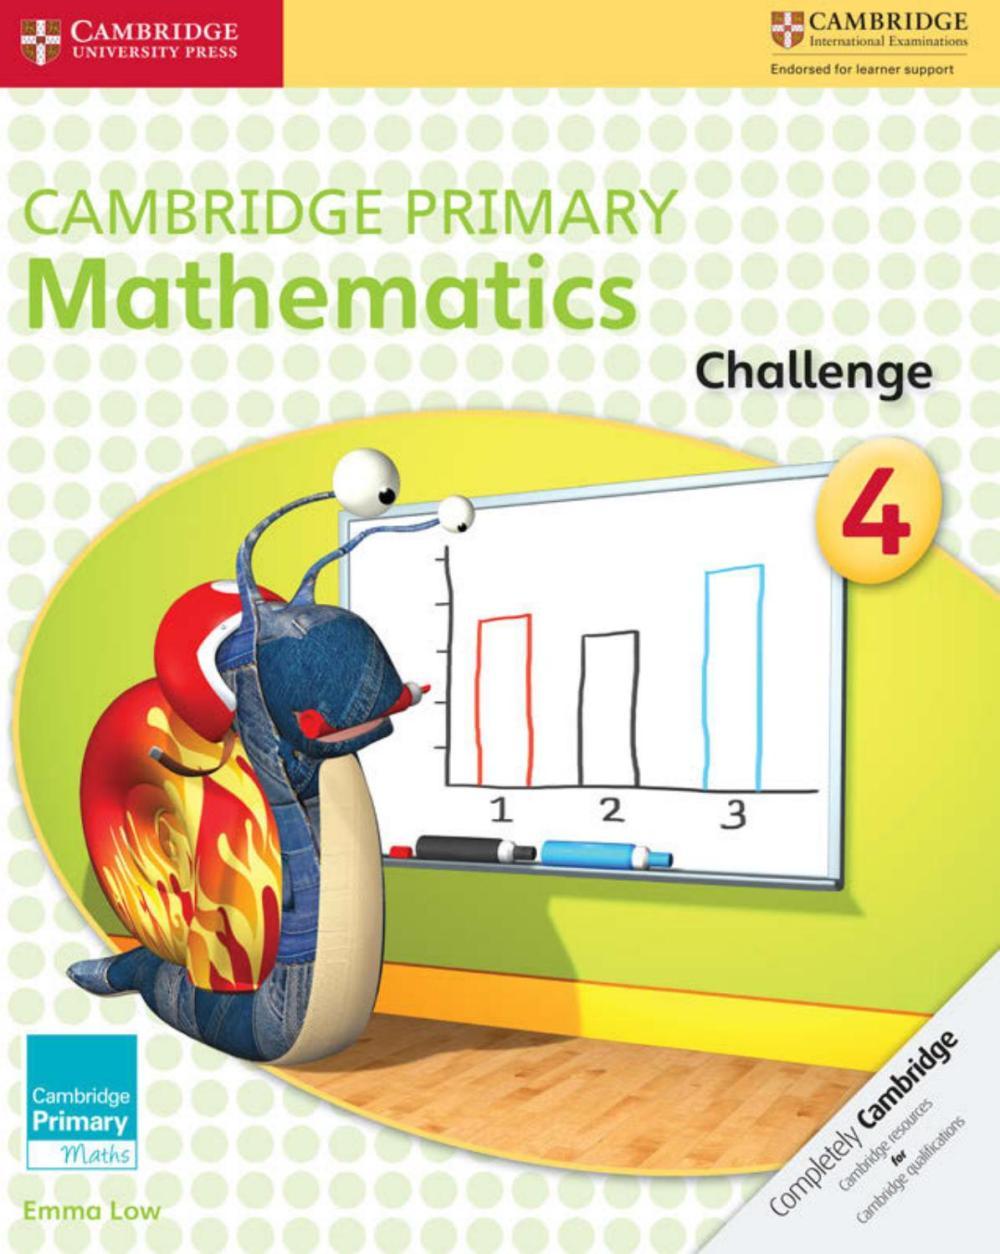 medium resolution of Preview Cambridge Primary Mathematics Challenge 4 by Cambridge University  Press Education - issuu